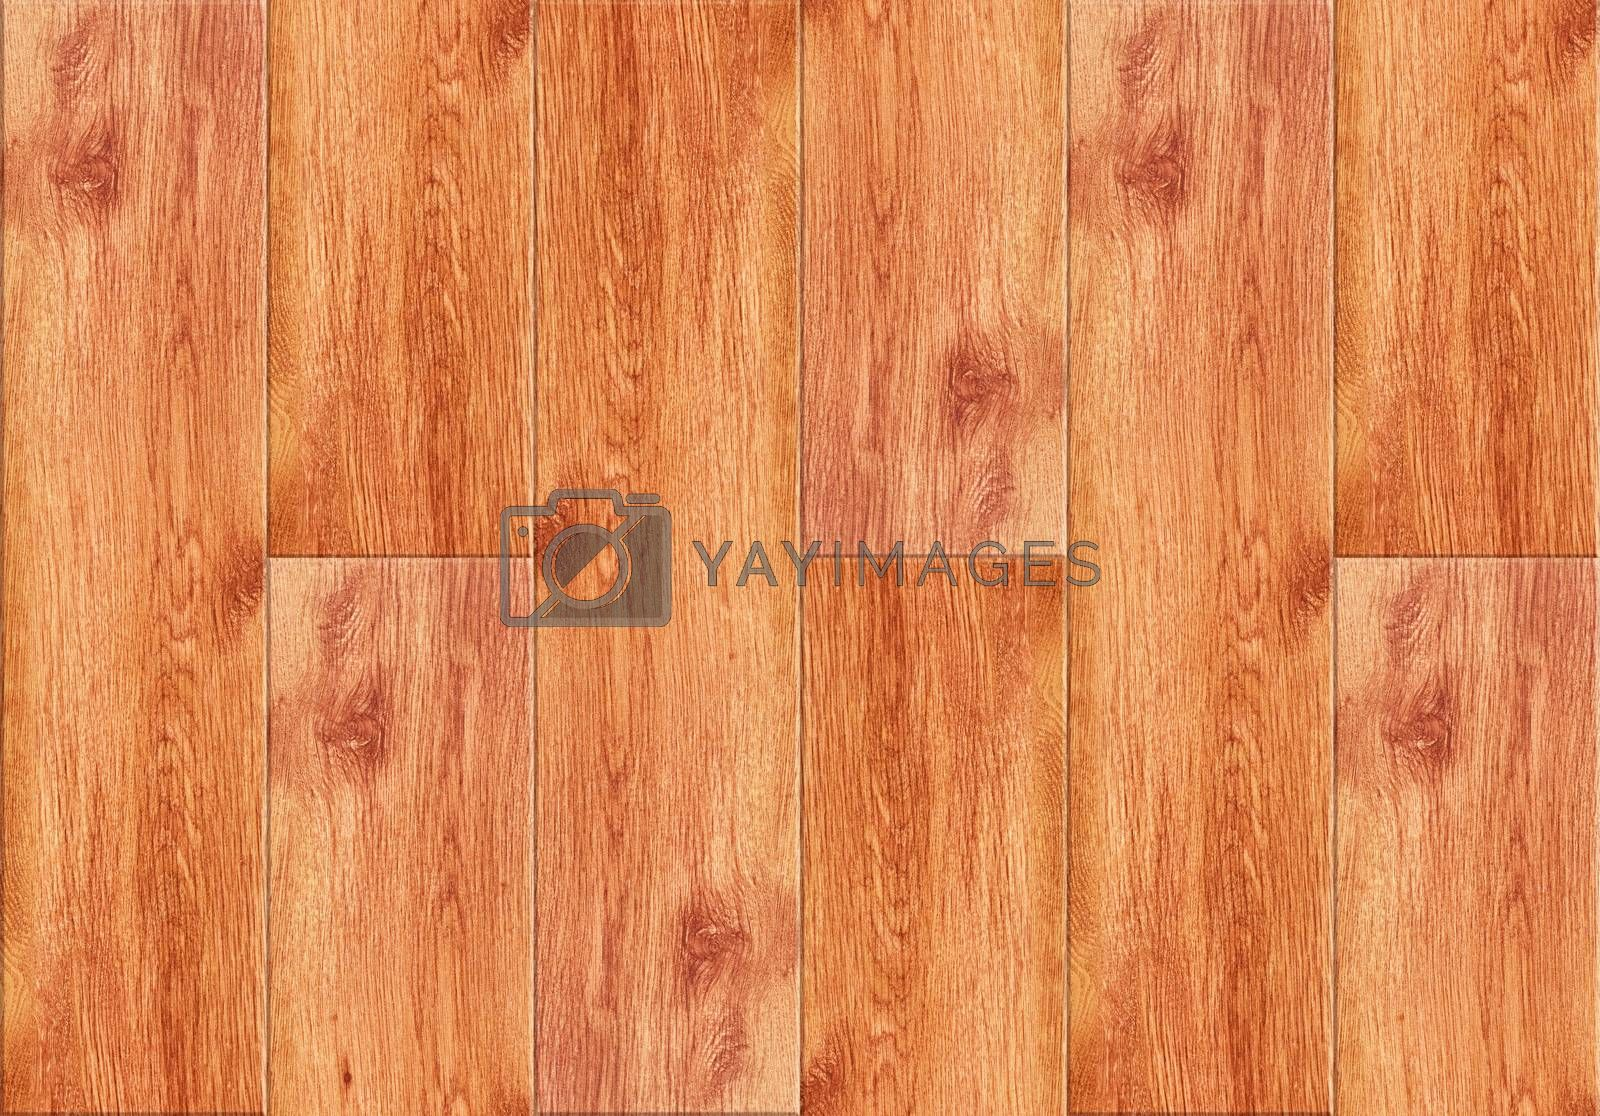 Seamless wood laminated floor texture pattern as interior design background